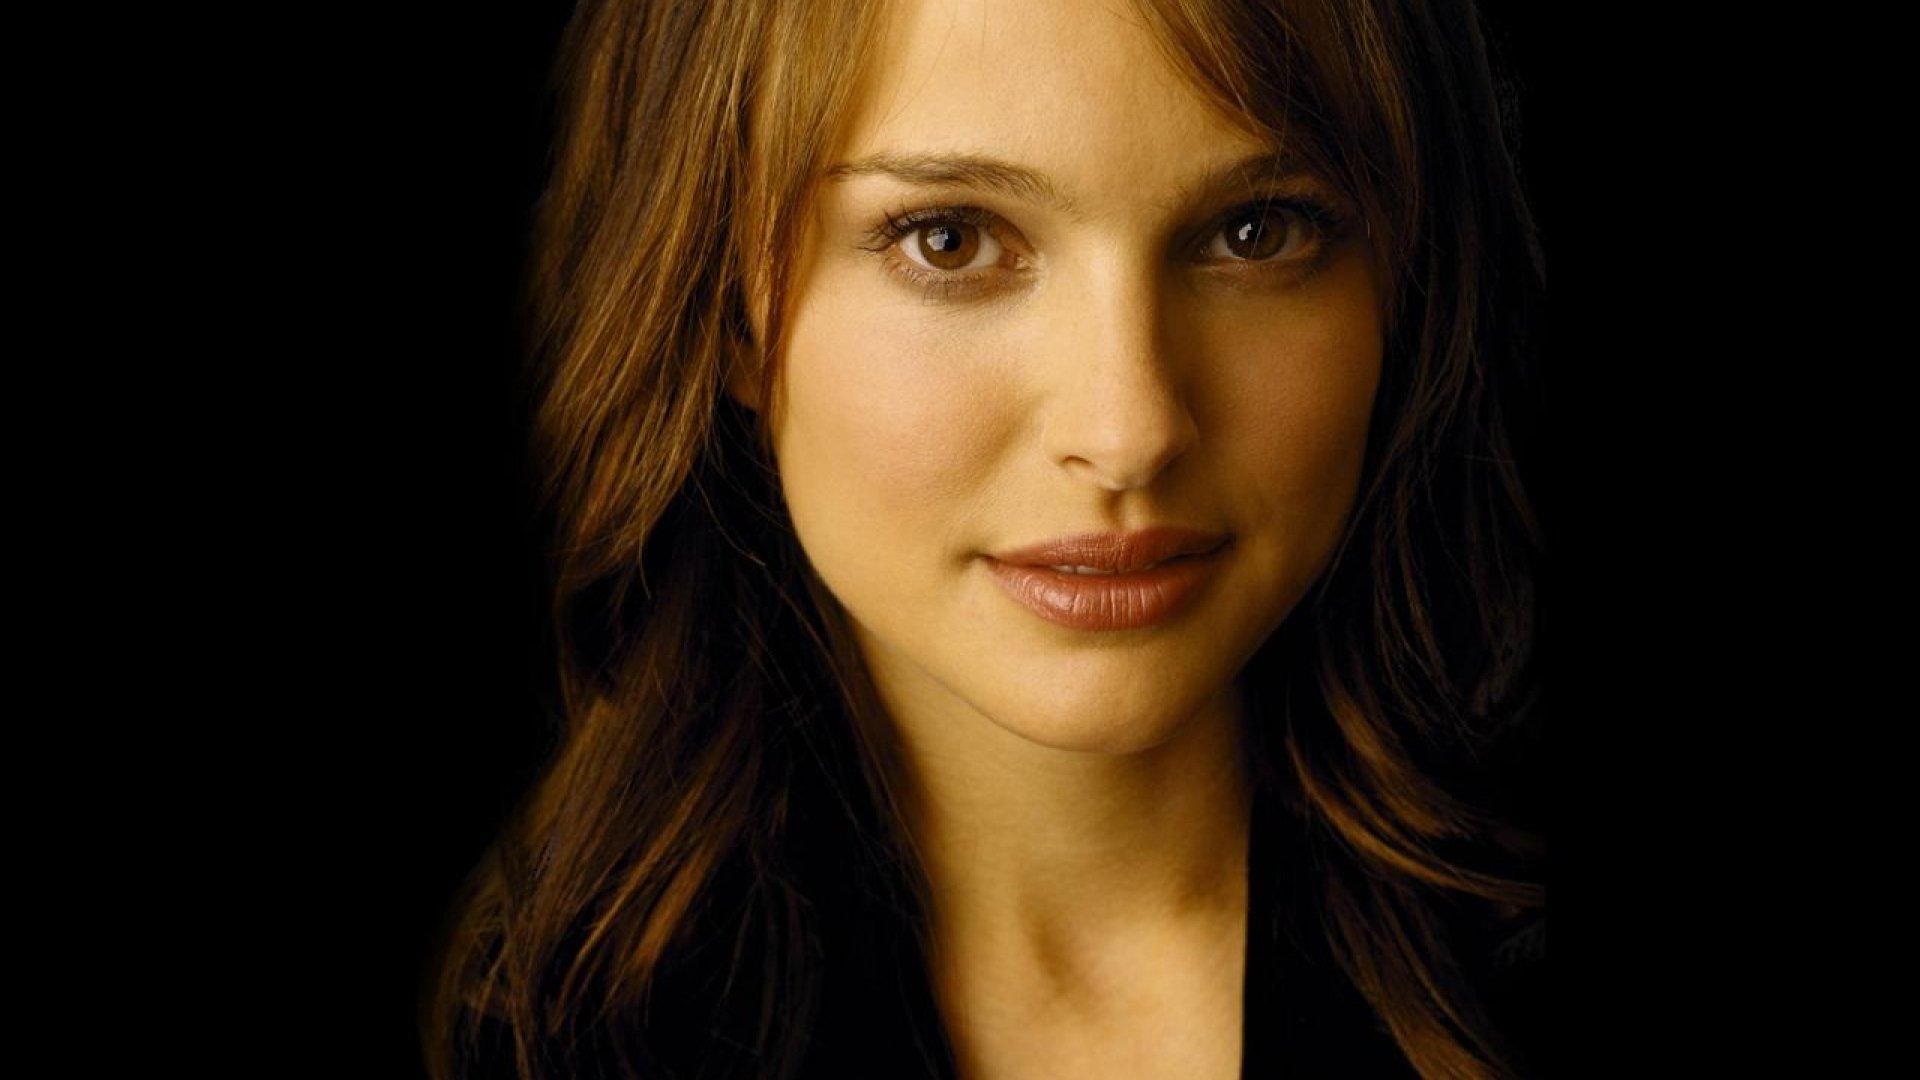 Berühmtheiten - Natalie Portman  Wallpaper